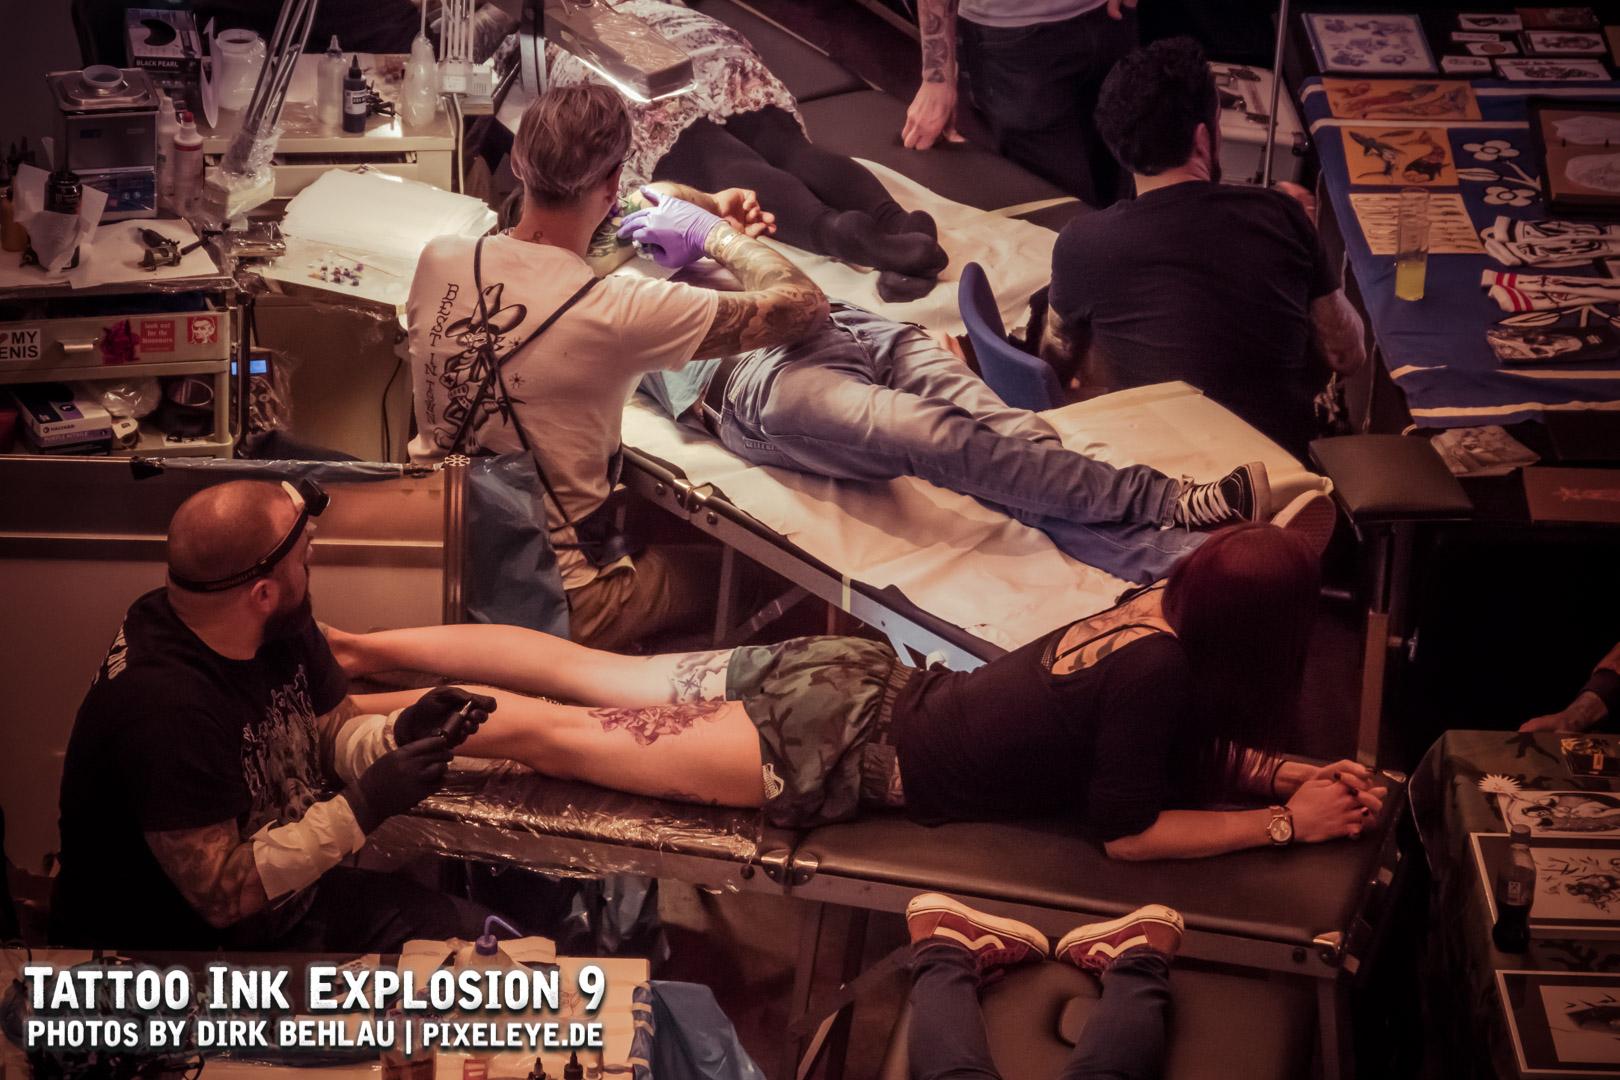 Tattoo Ink Explosion 2018 WEB by Dirk Behlau-0484.jpg